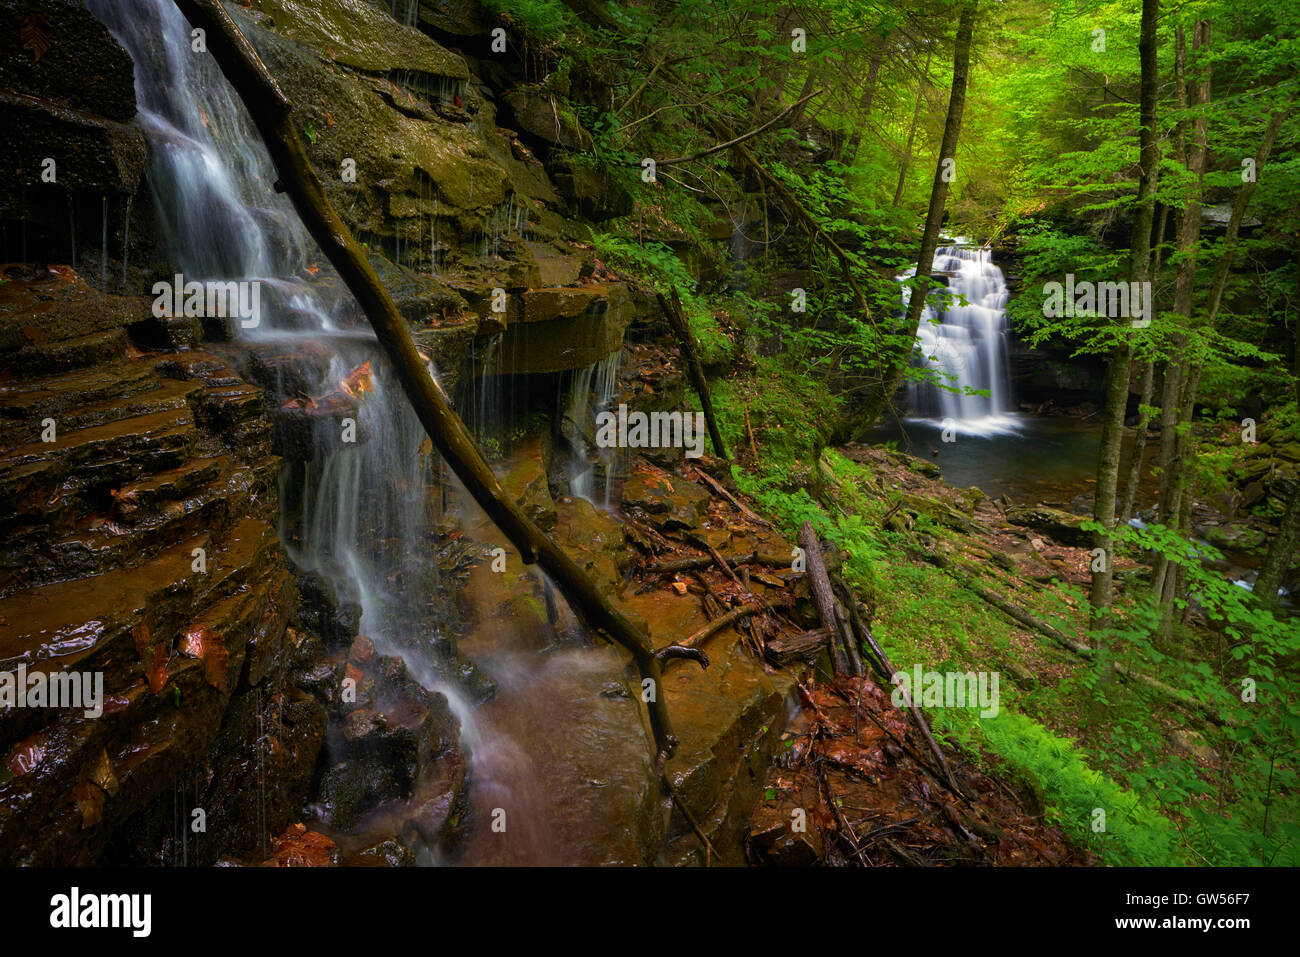 Spring runoff at Big Falls along Heberly Run near Jamison City in Luzerne County, Pennsylvania - Stock Image